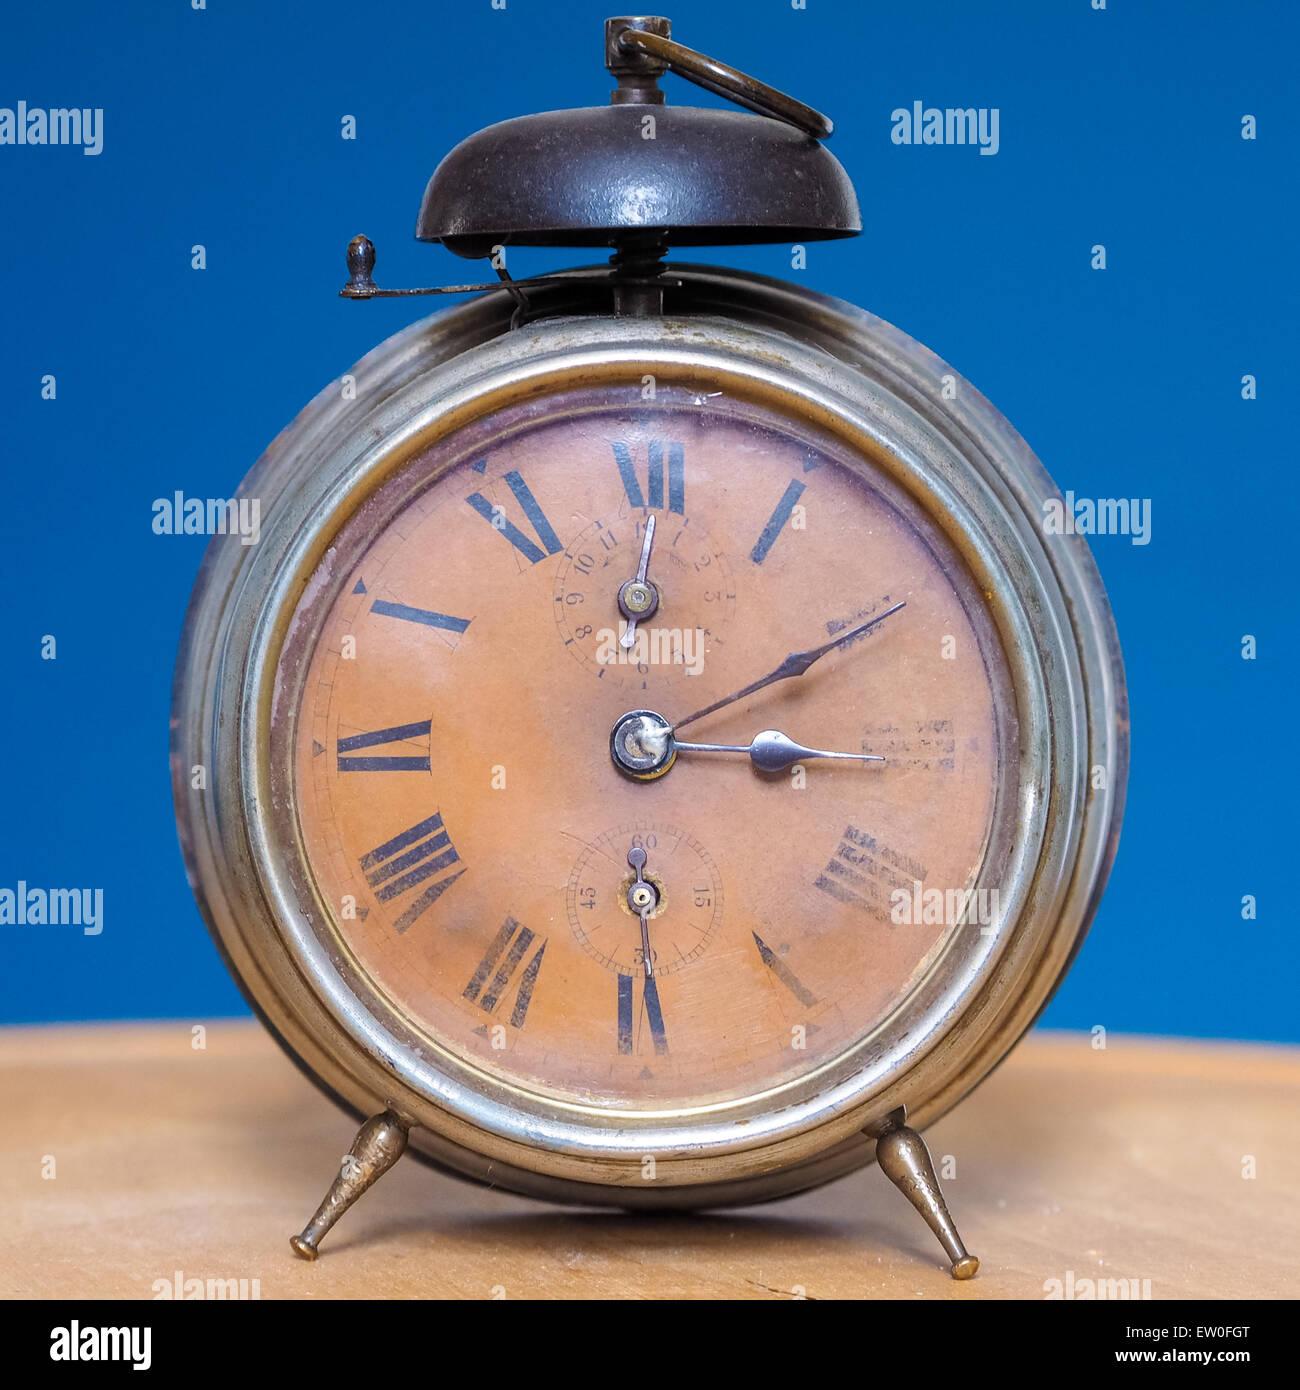 Vintage table alarm clock on wooden desk, retro style. - Stock Image